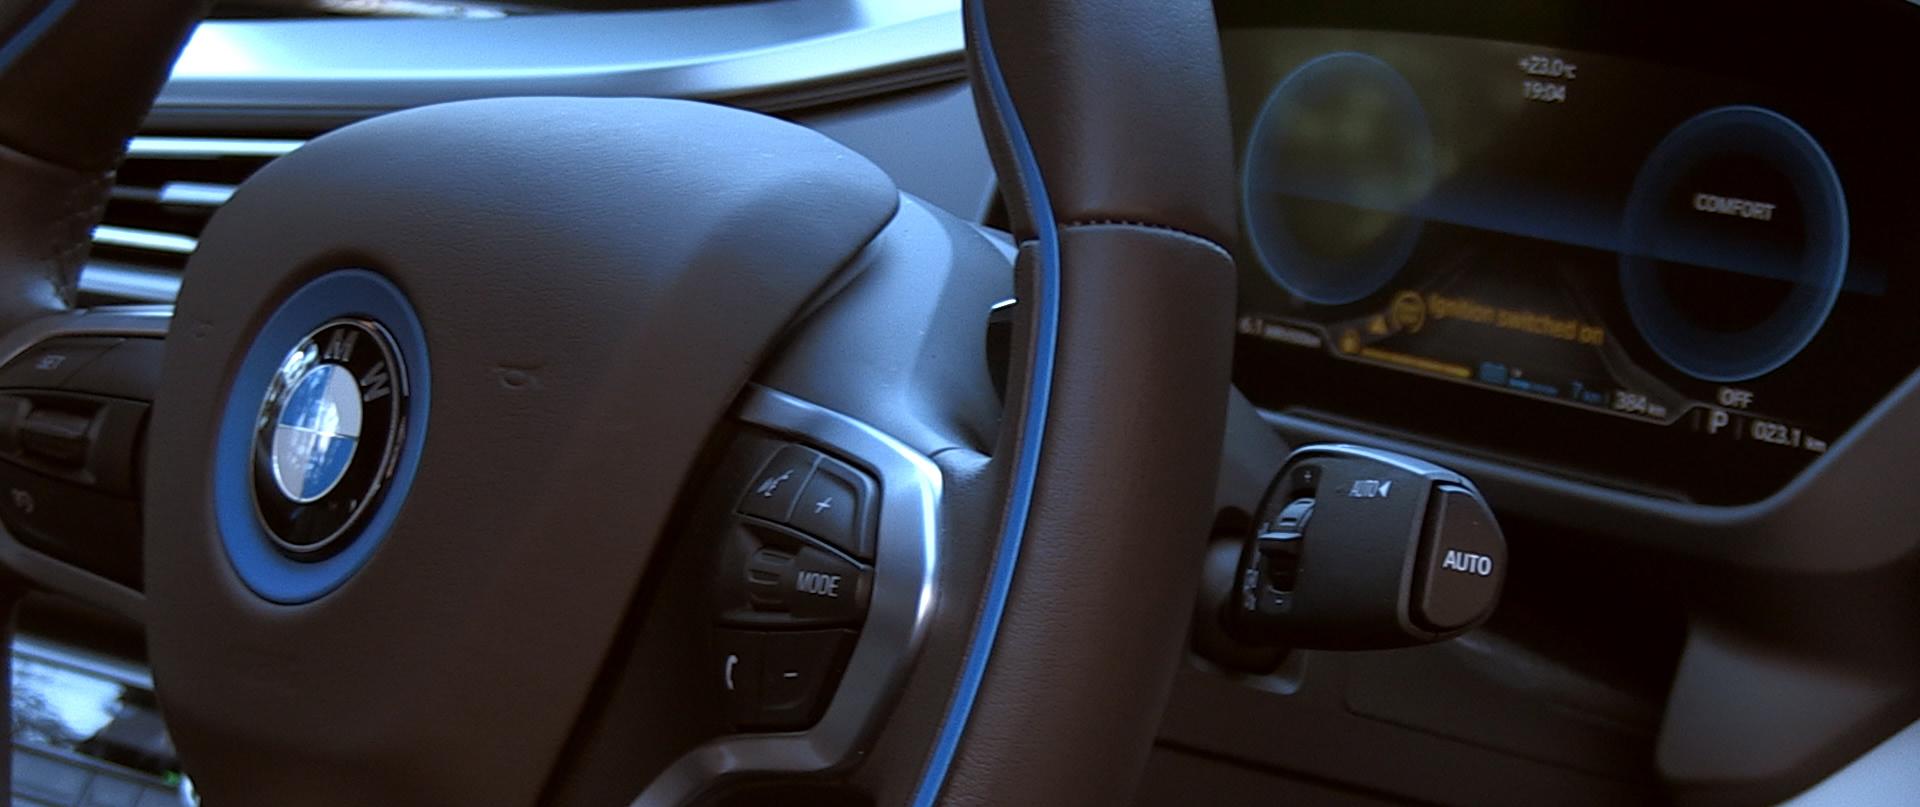 BMW i8 26.jpg